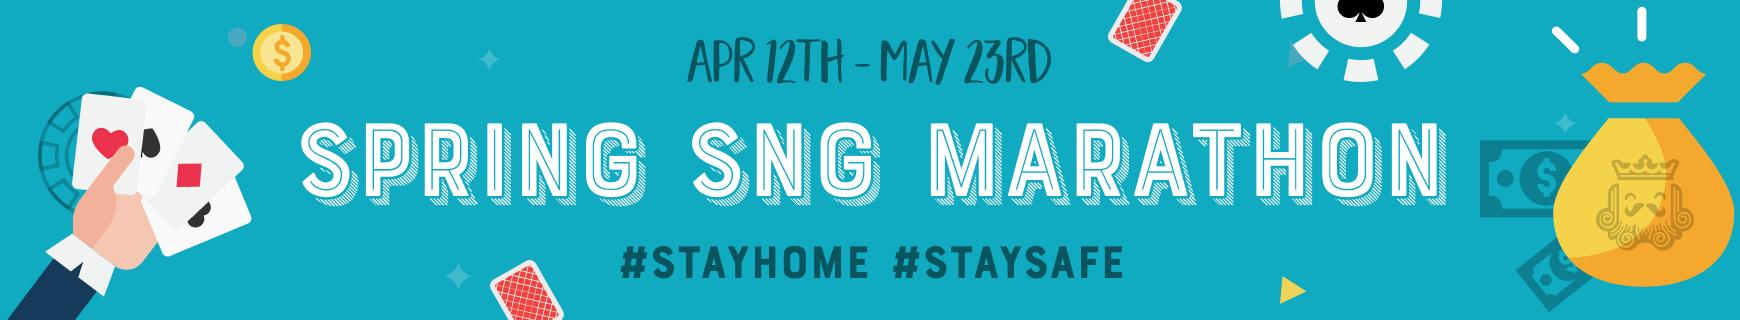 Staysafe   spring sng marathon   dashboard %28870 x 160%29